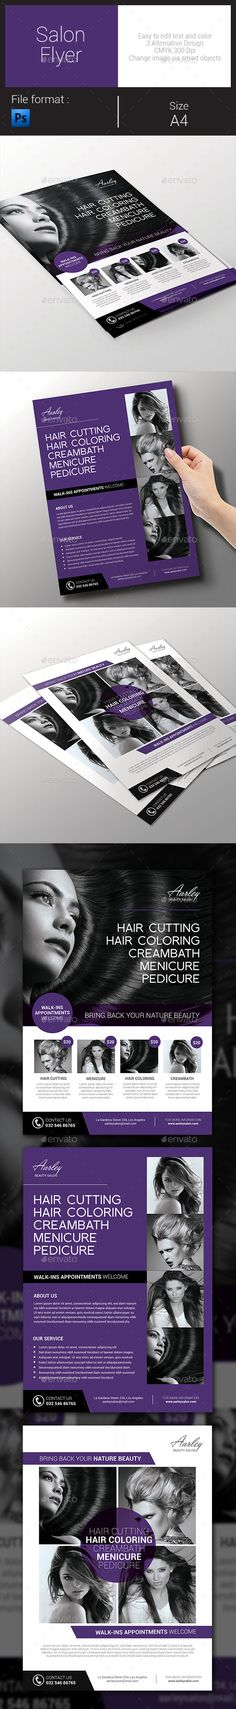 Salon Flyer — Photoshop PSD #skin #ad • Available here → https://graphicriver.net/item/salon-flyer/9172840?ref=pxcr